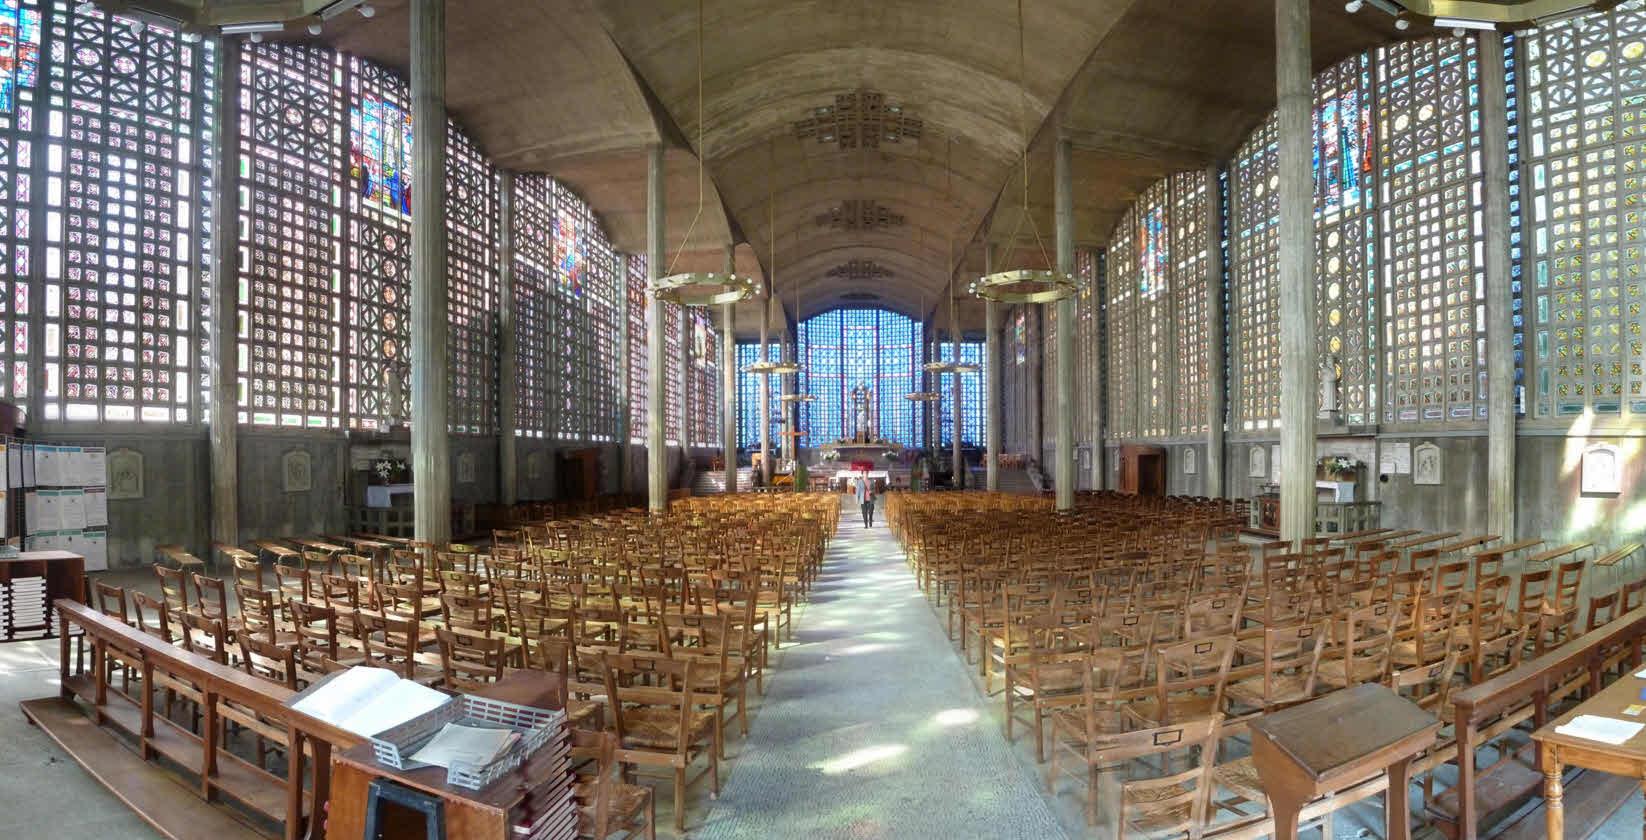 Kirche Notre-Dame du Raincy